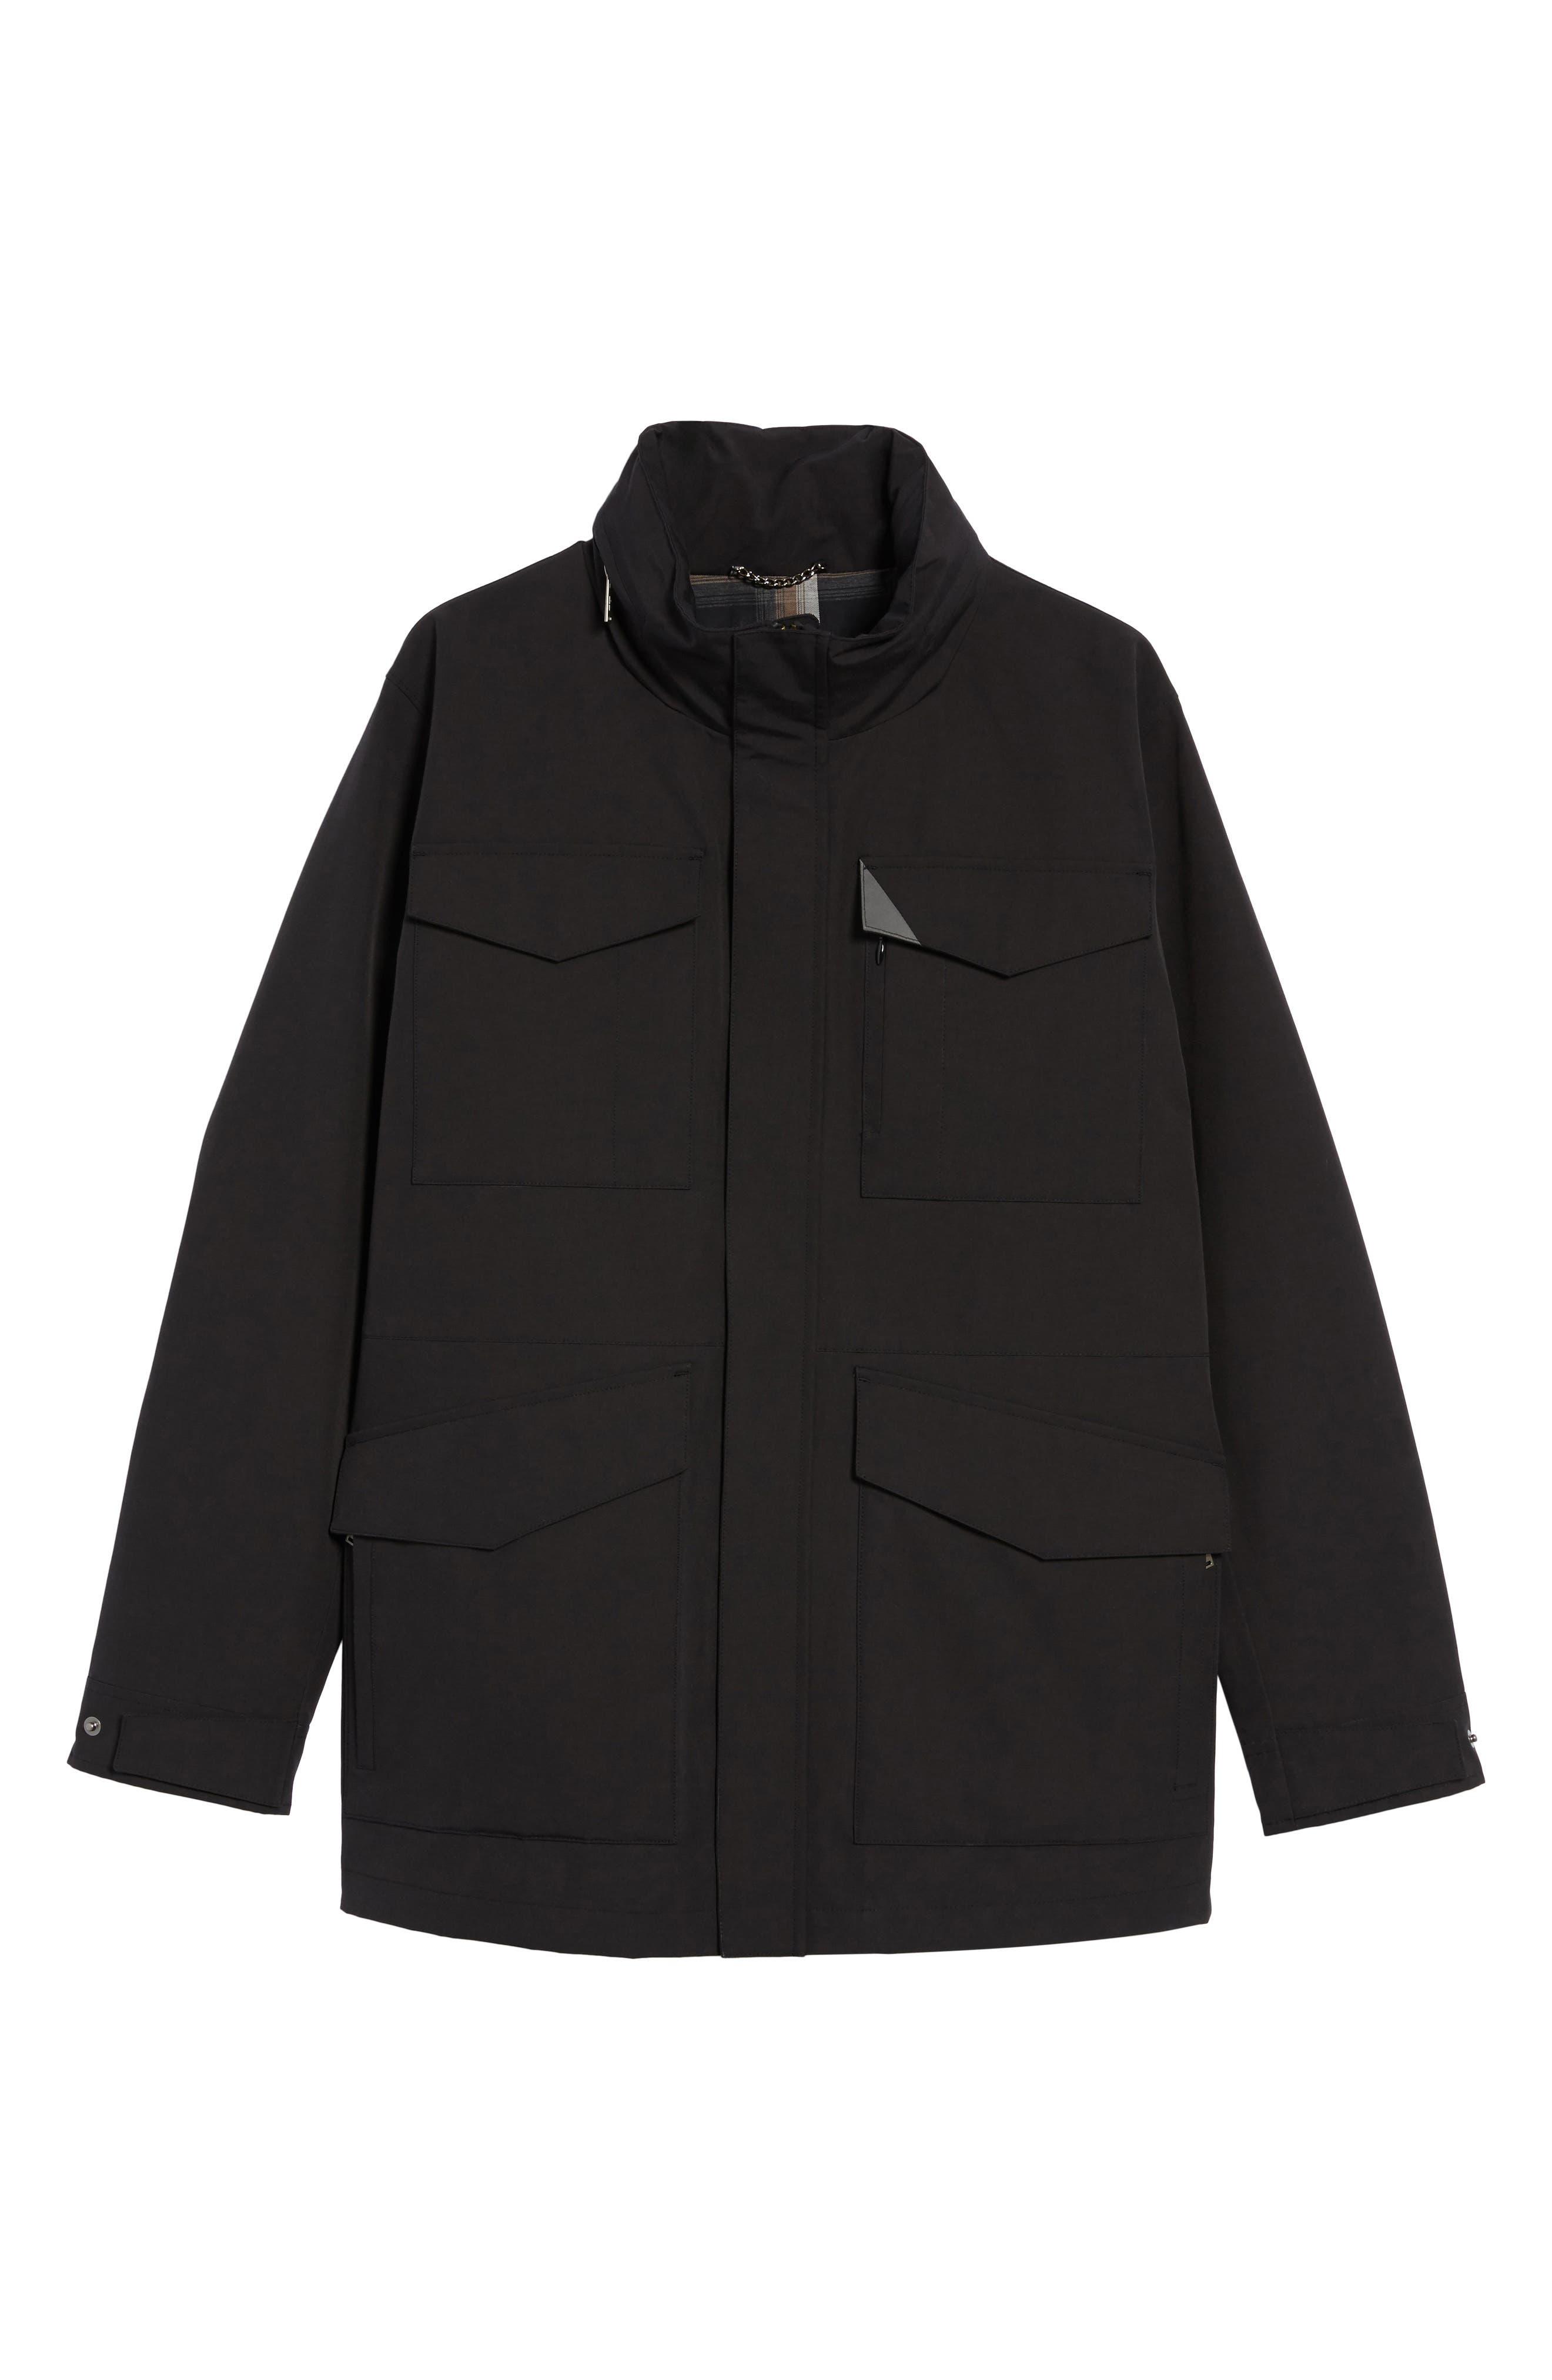 Clyde Hill Waterproof Field Jacket,                             Alternate thumbnail 6, color,                             Black